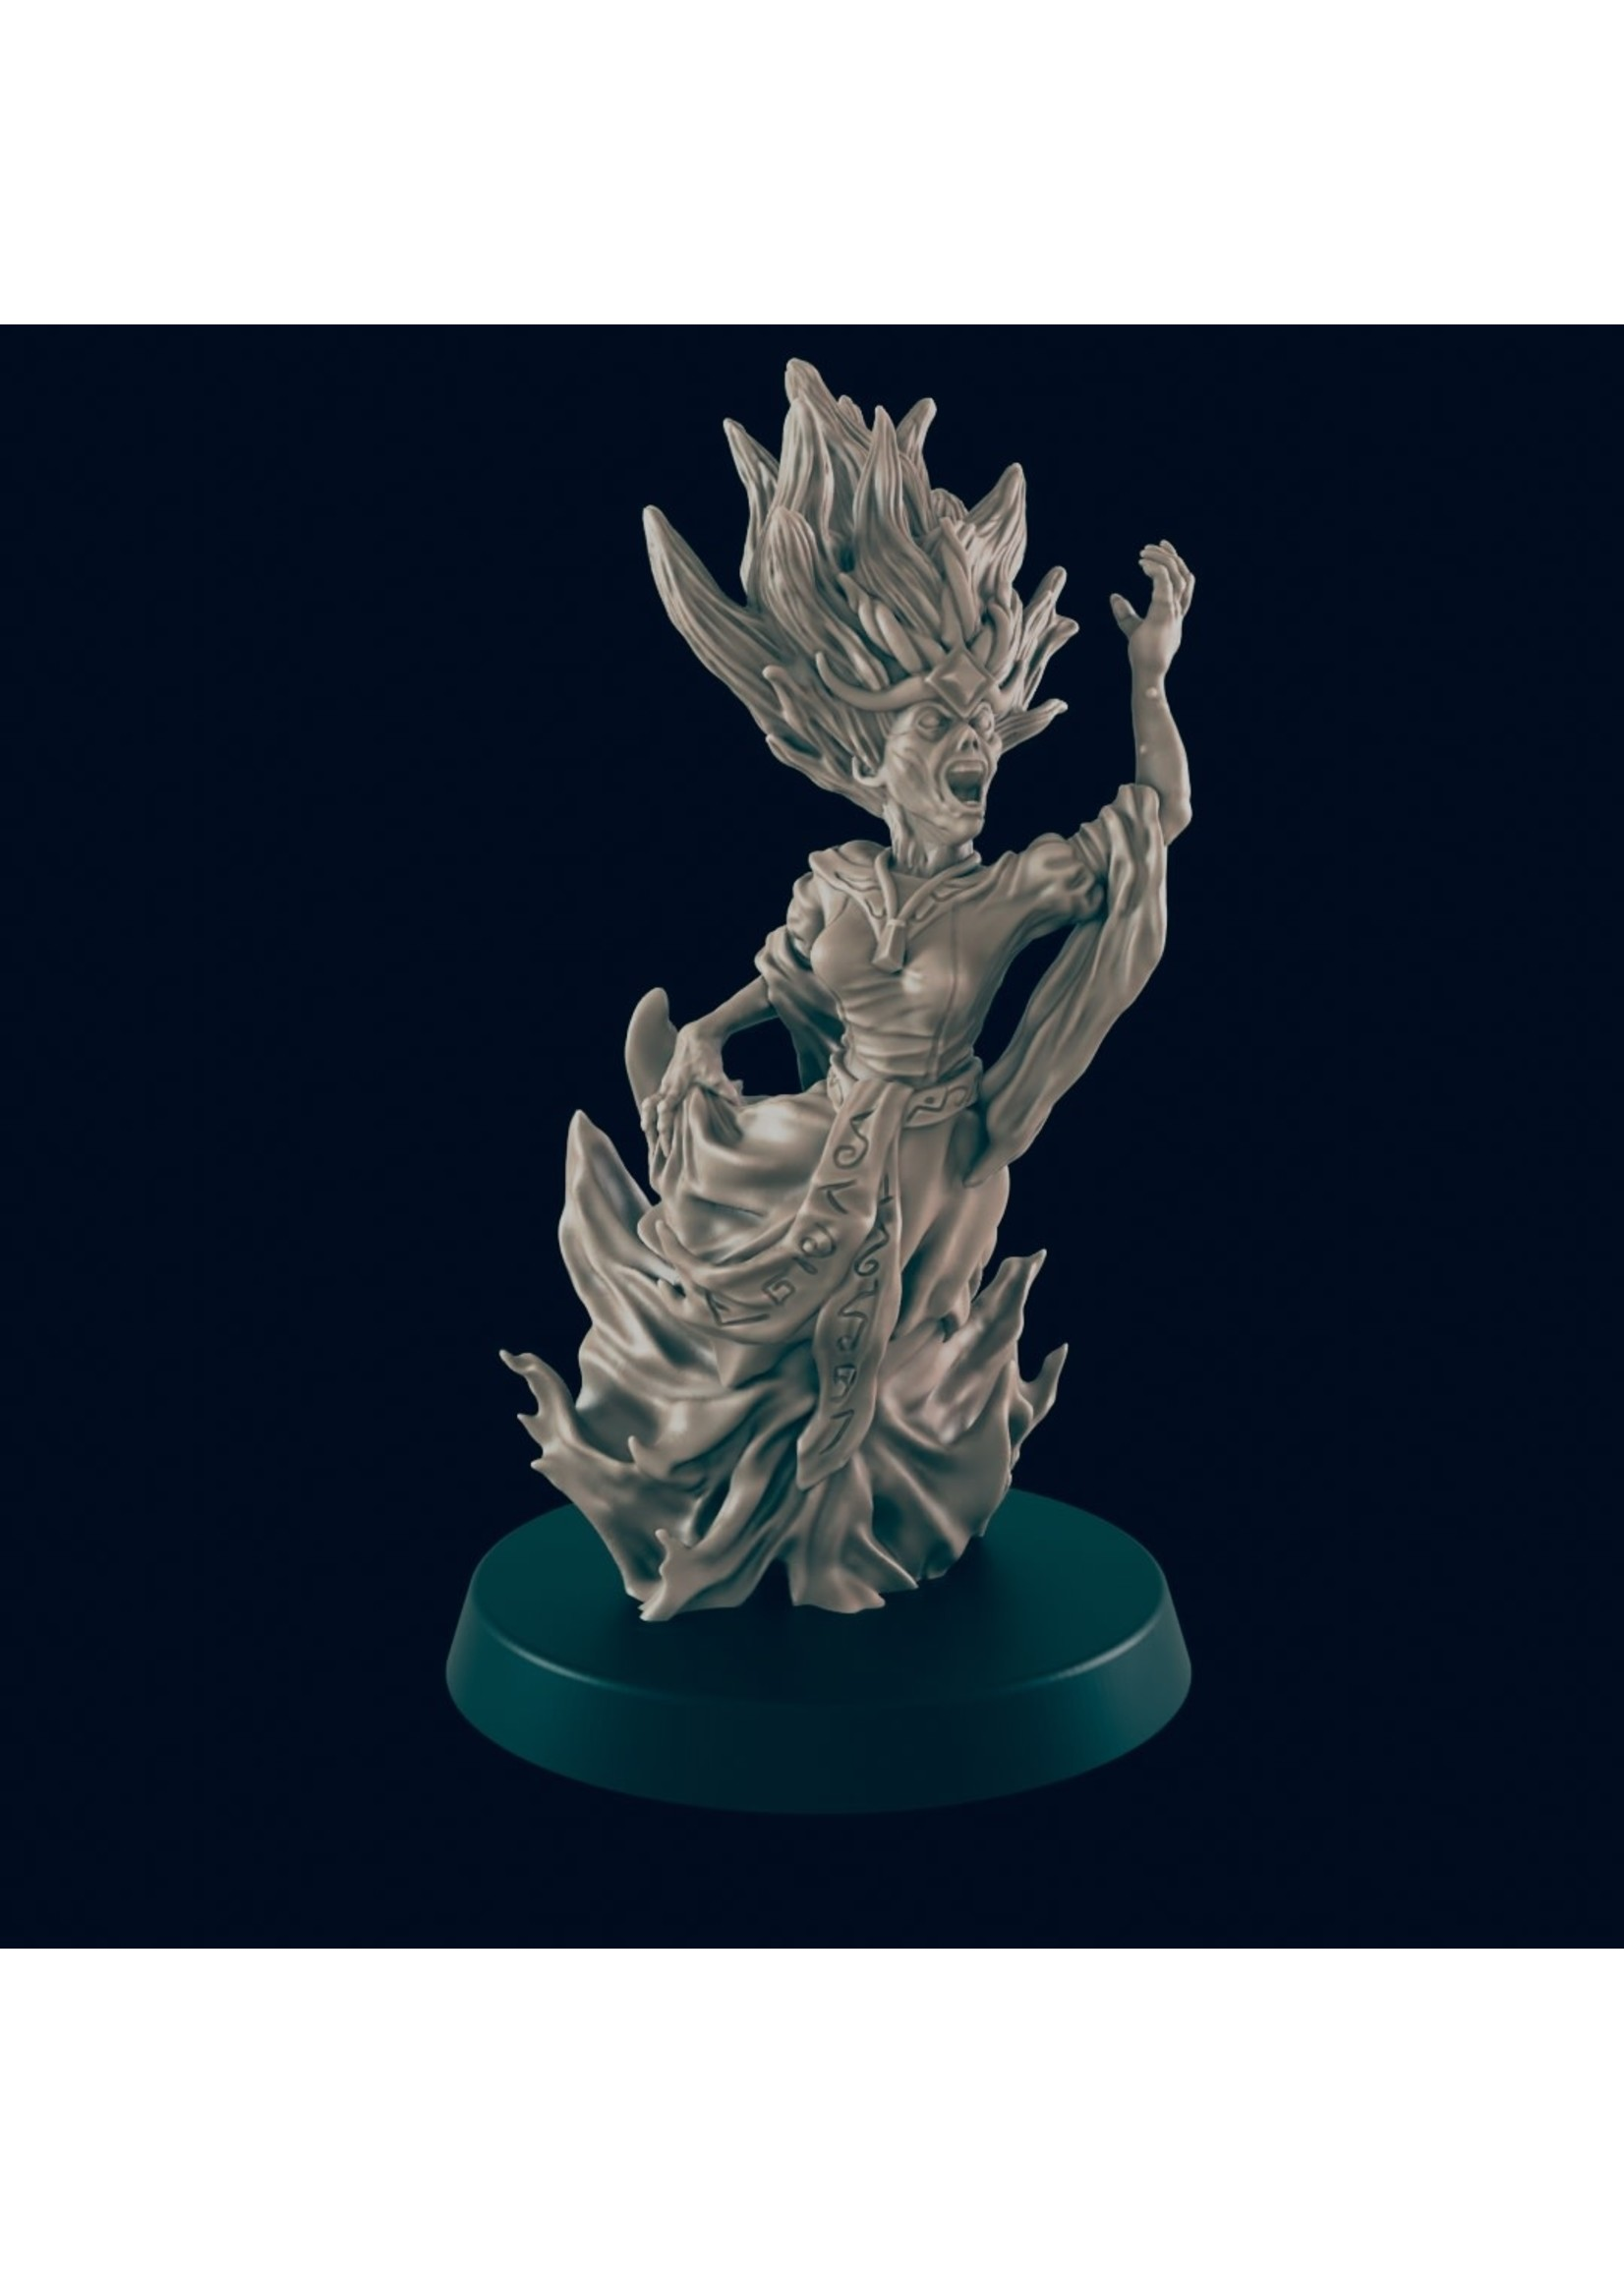 3D Printed Miniature - Banshee - Dungeons & Dragons - Beasts and Baddies KS